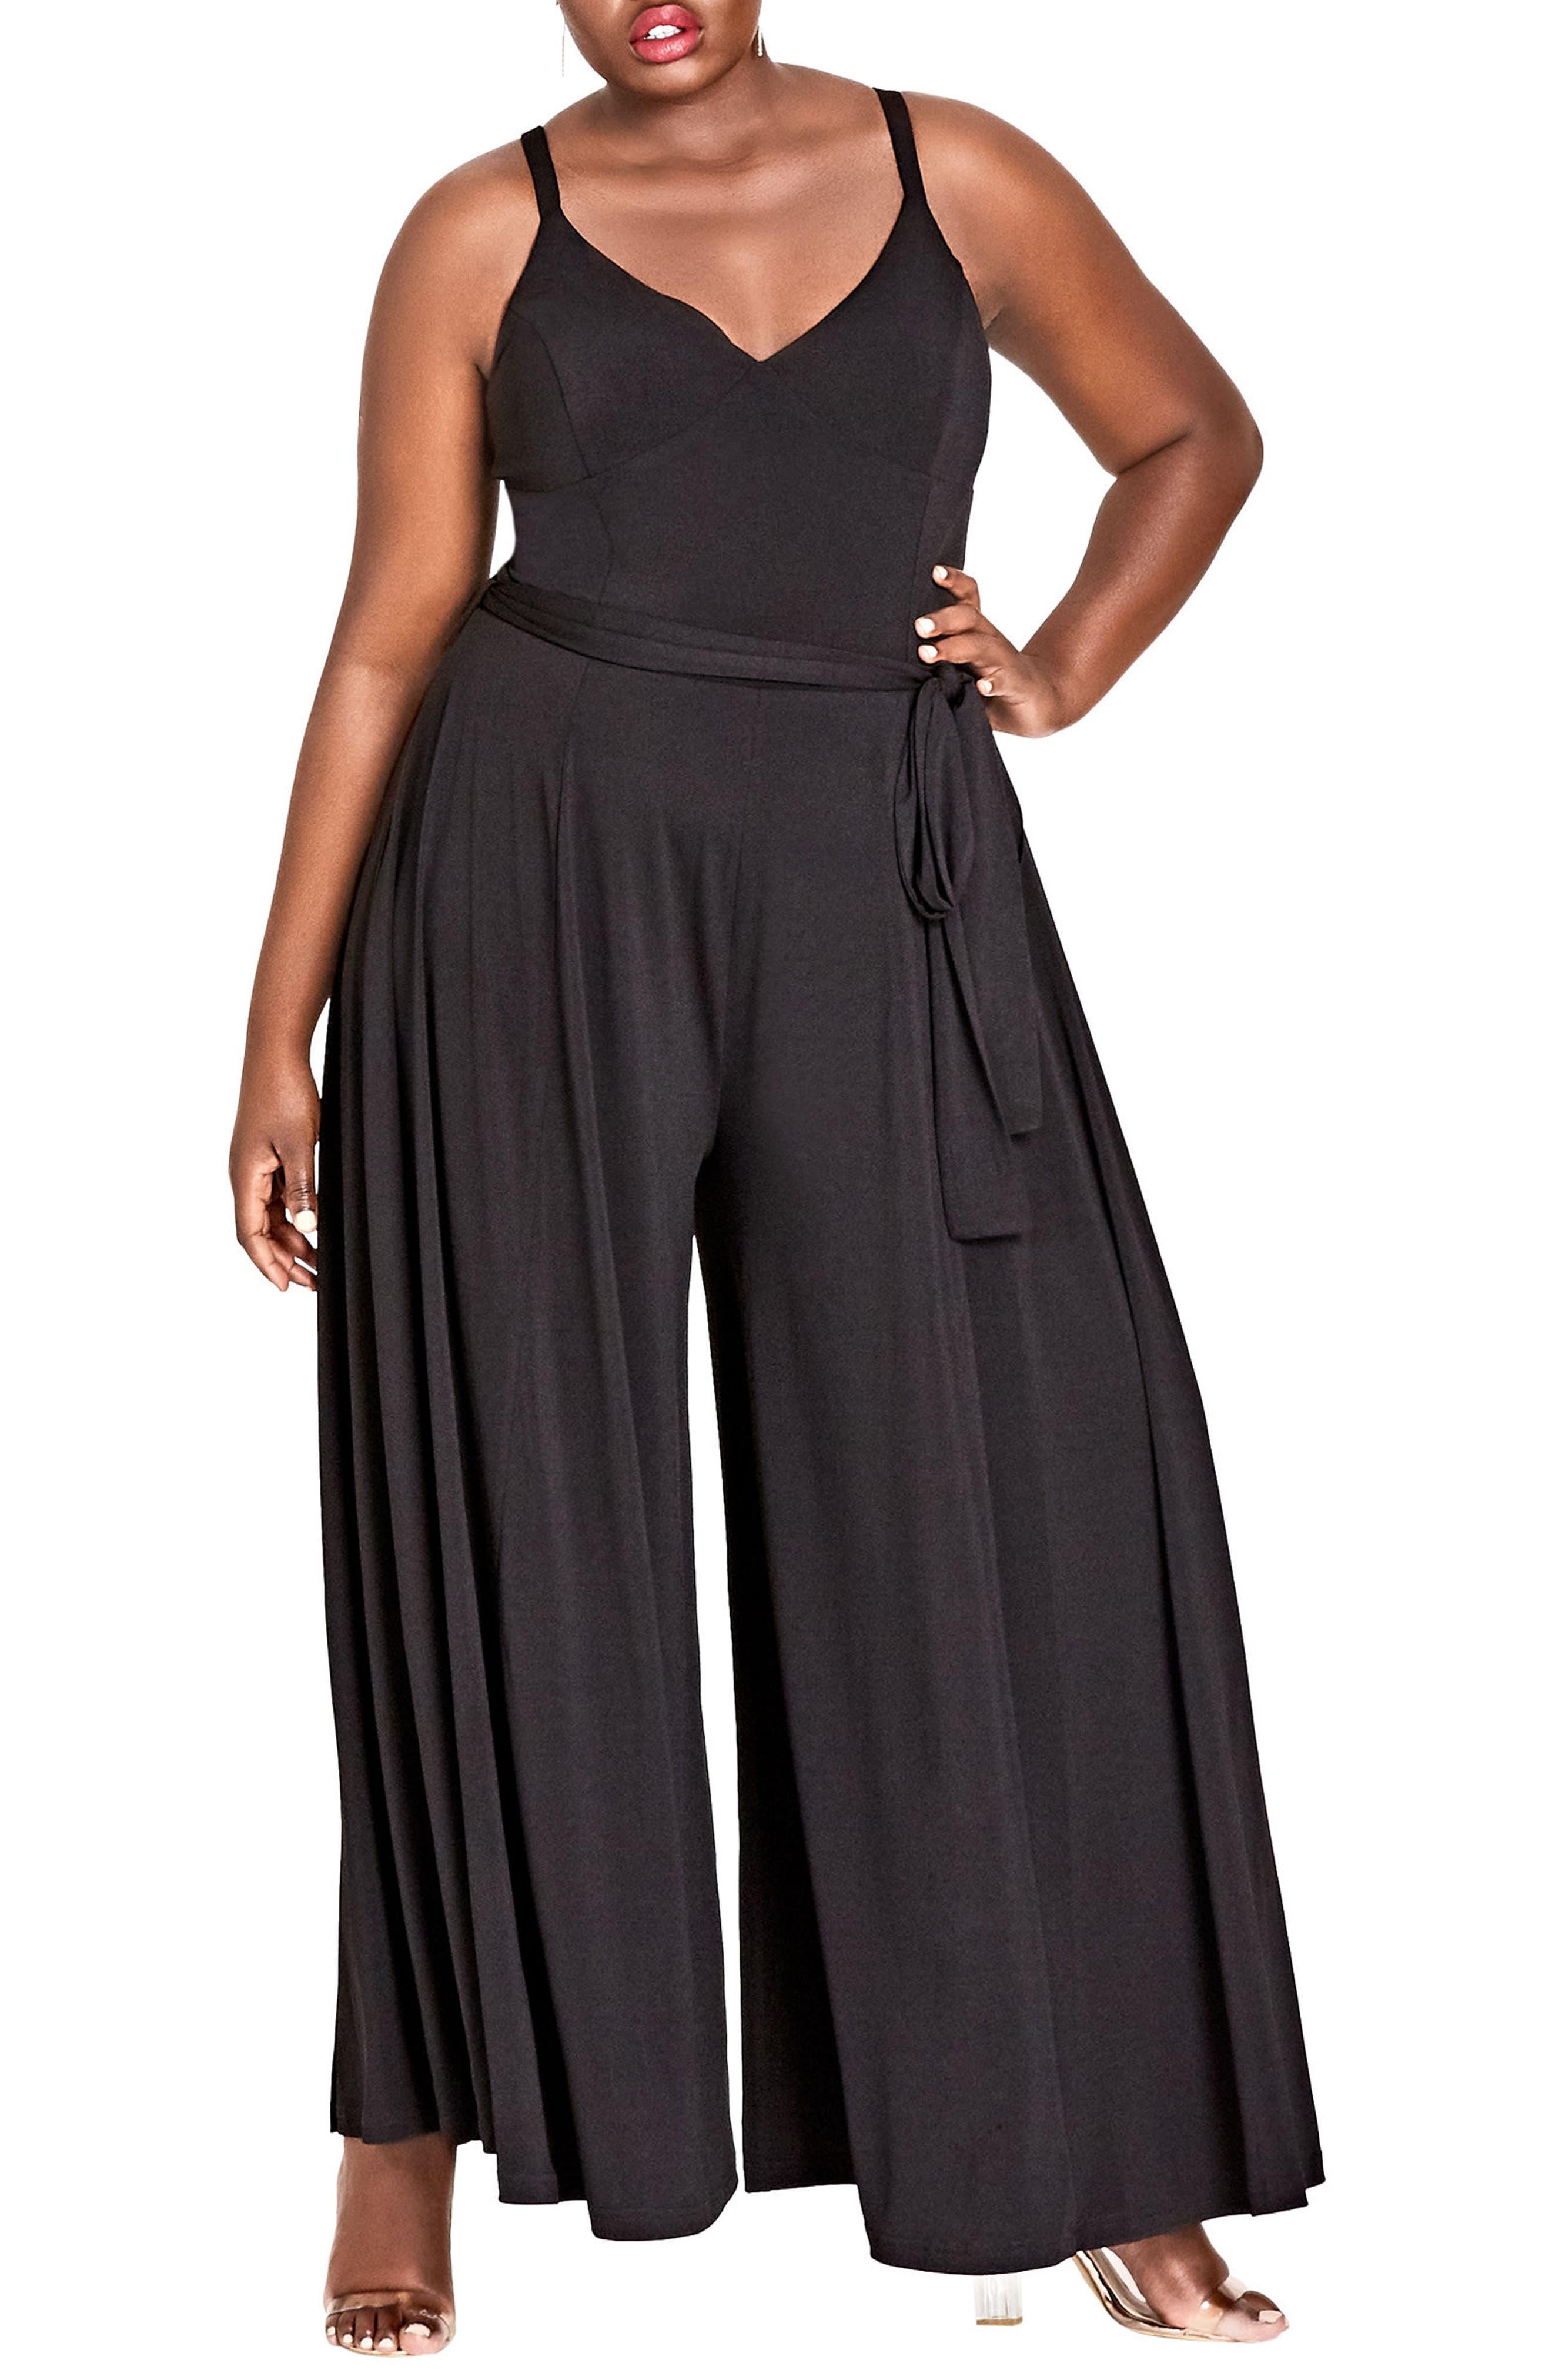 Miss Slinky Jumpsuit,                         Main,                         color, Black